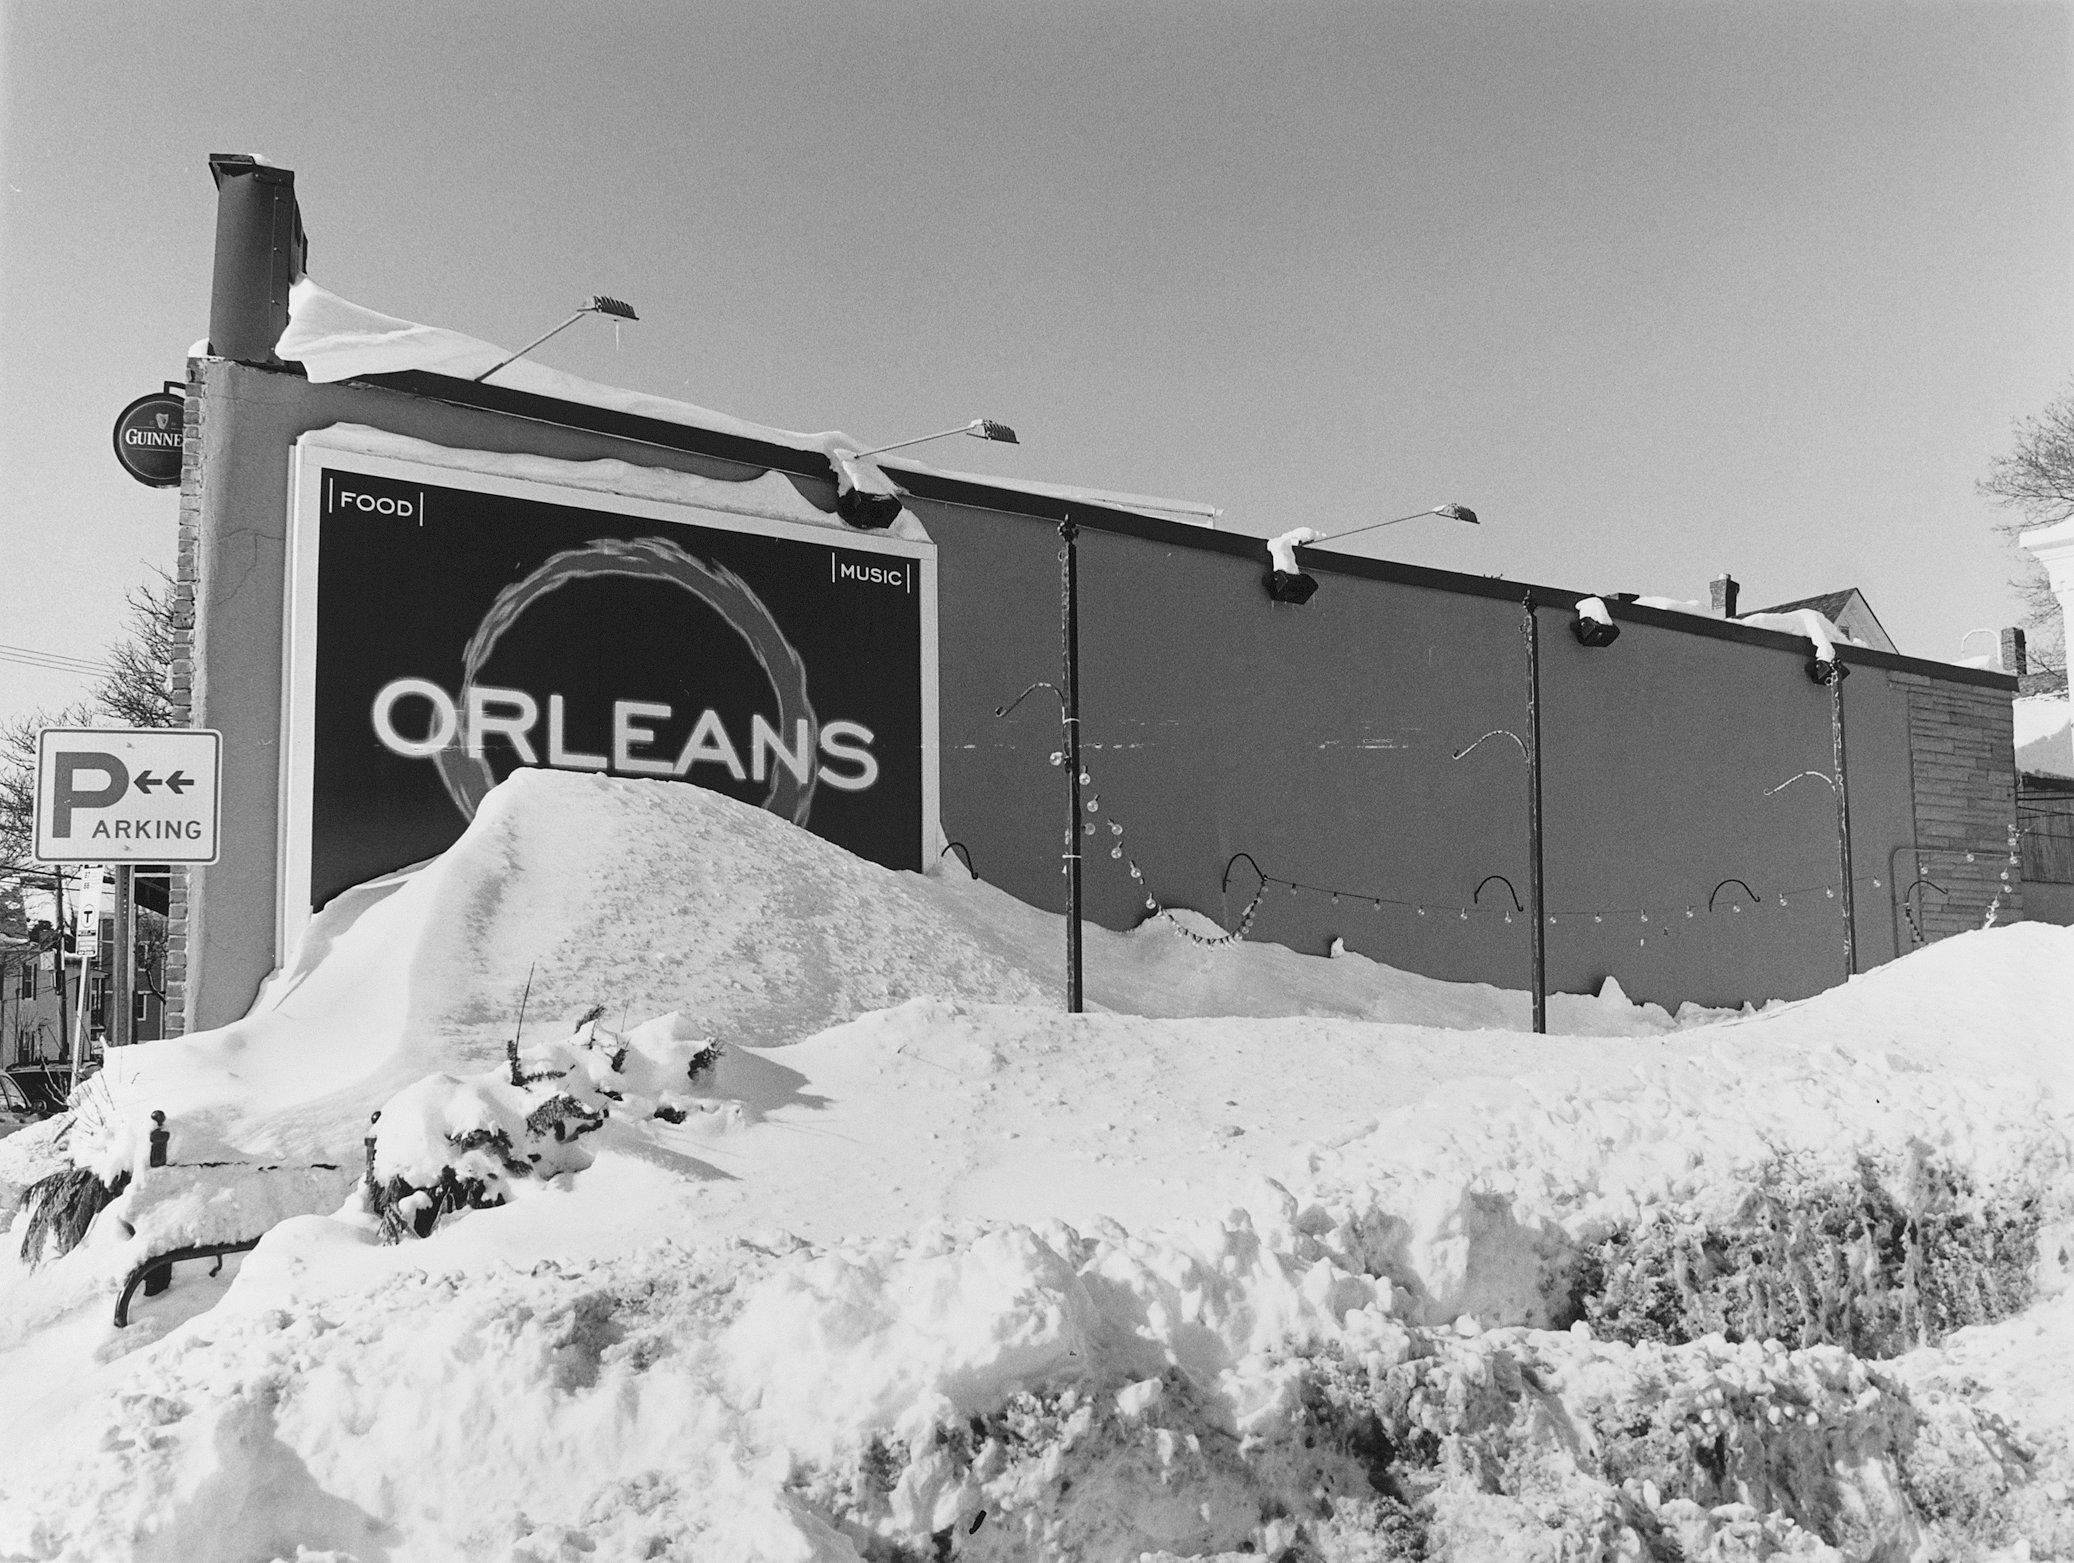 Orleans 2.jpg